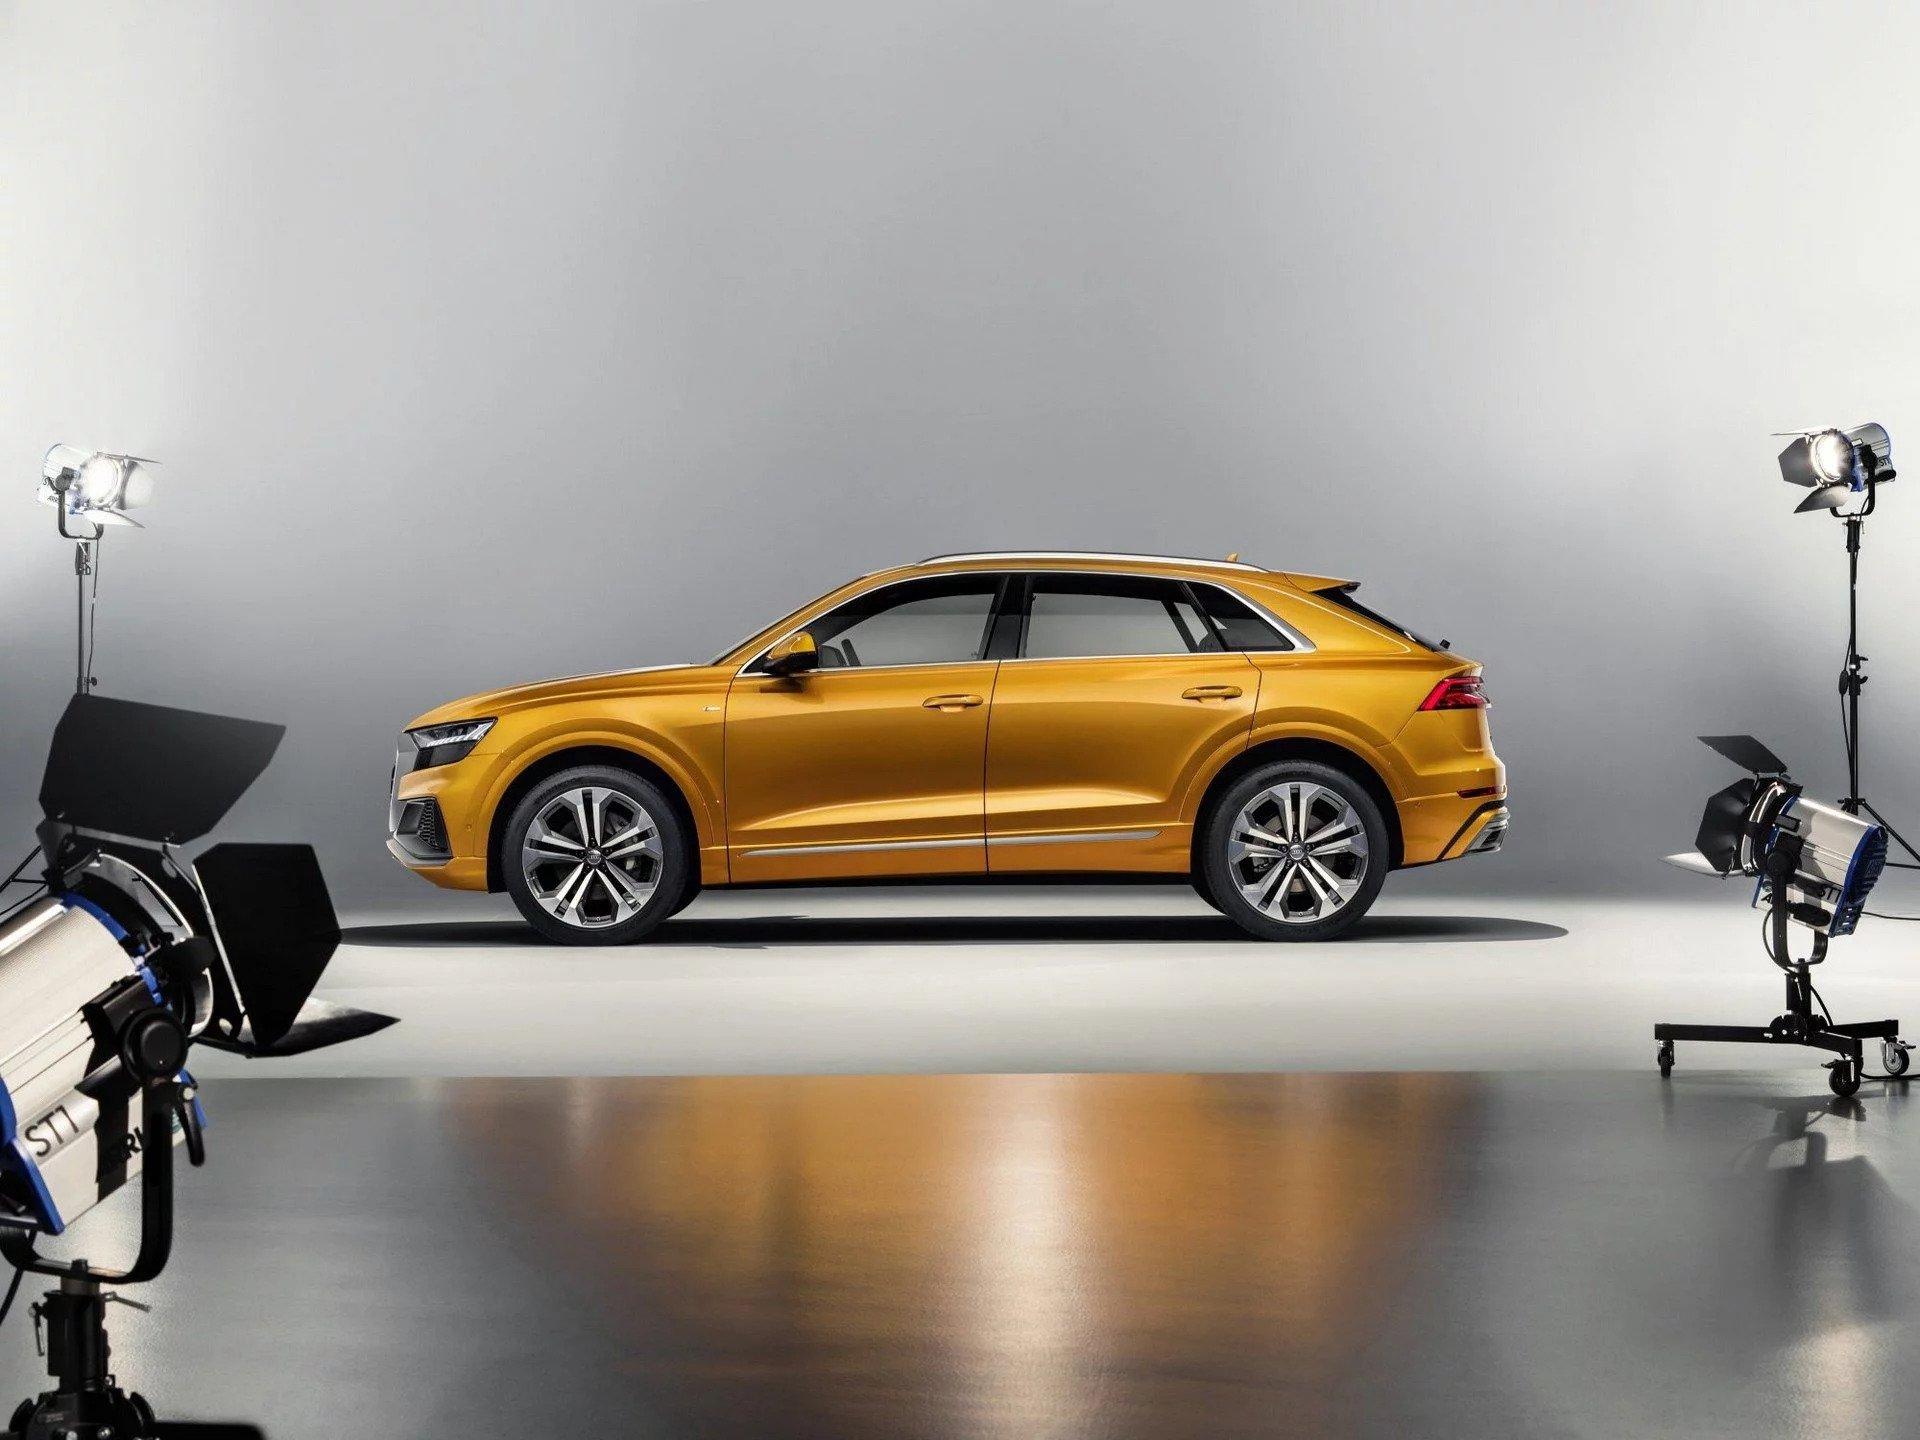 2019 Audi Q8 2019 Audi Q8